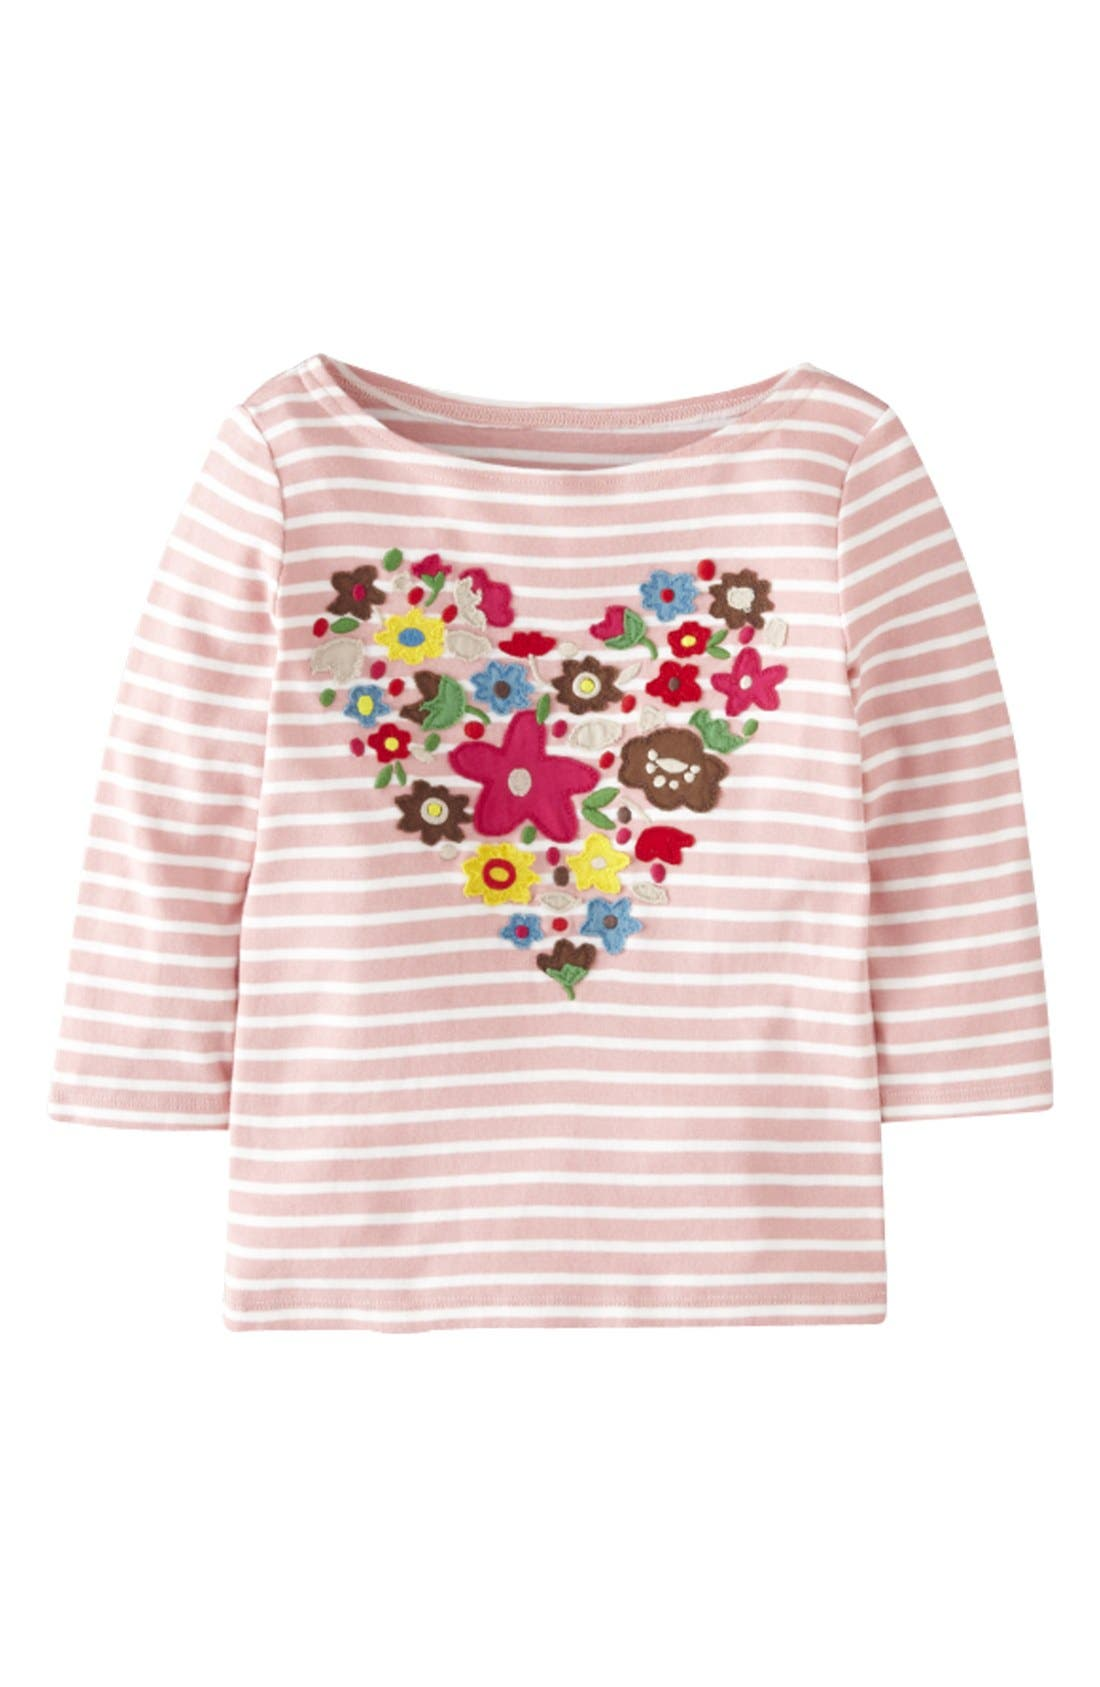 Alternate Image 1 Selected - Mini Boden 'Big Bloom' Appliqué Tee (Toddler Girls, Little Girls & Big Girls)